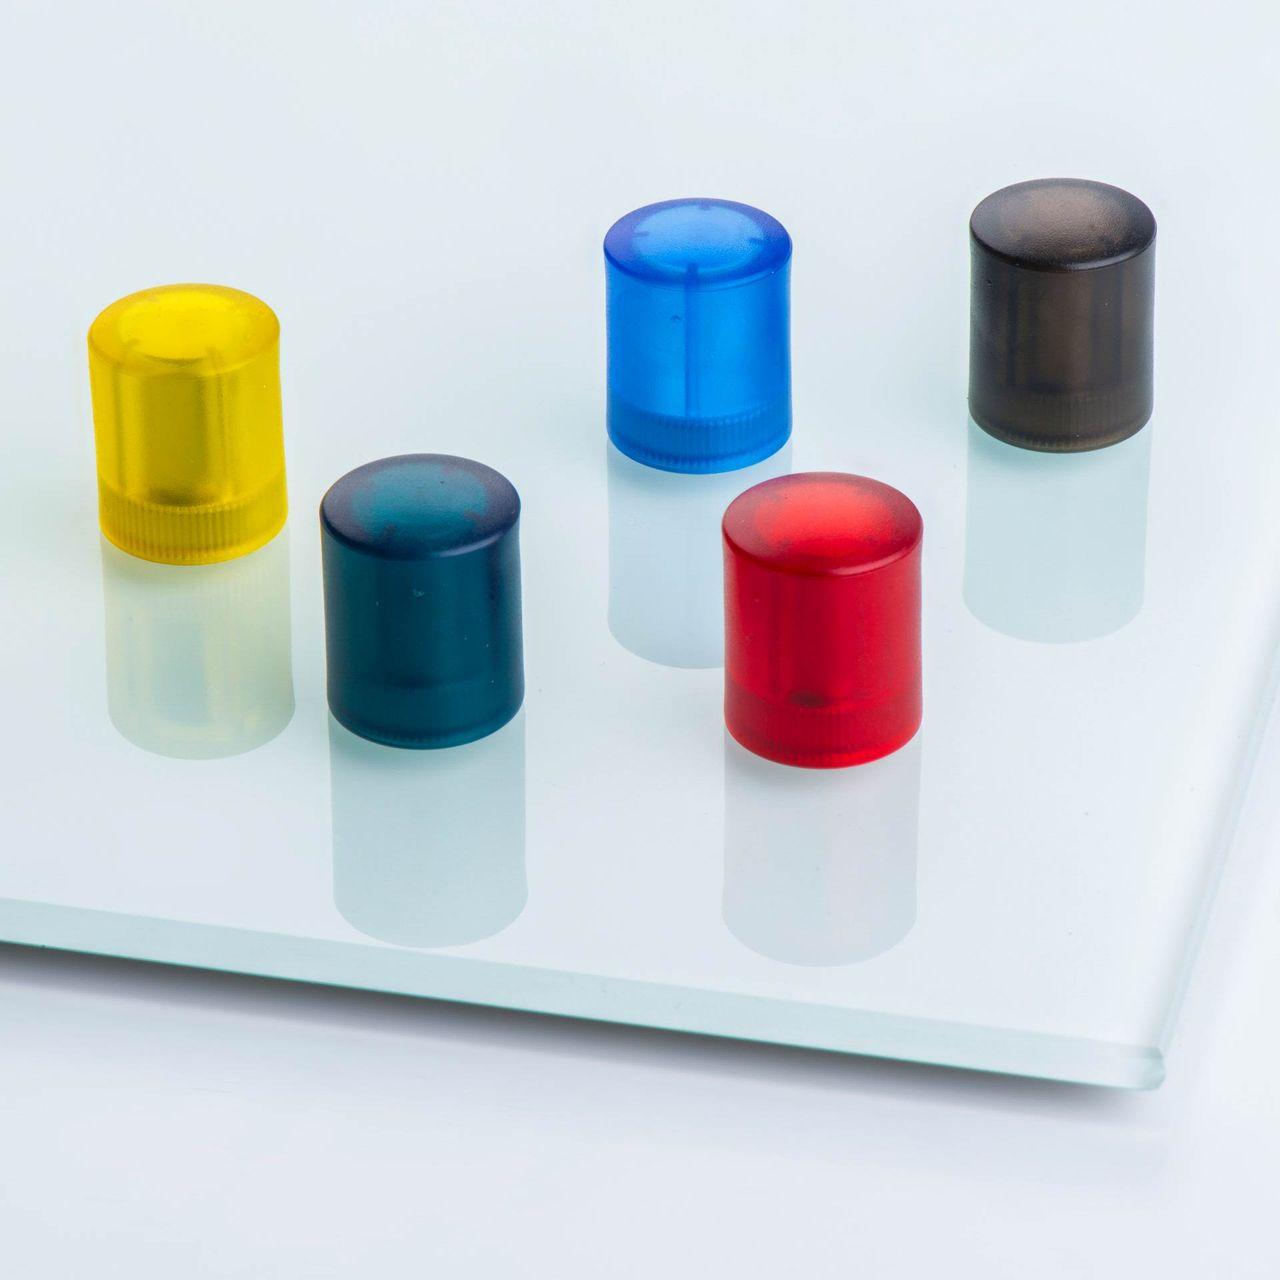 Glasboard magnet made of NdFeB with cylindrical plastic housing, coloured, thyssenkrupp Magnettechnik